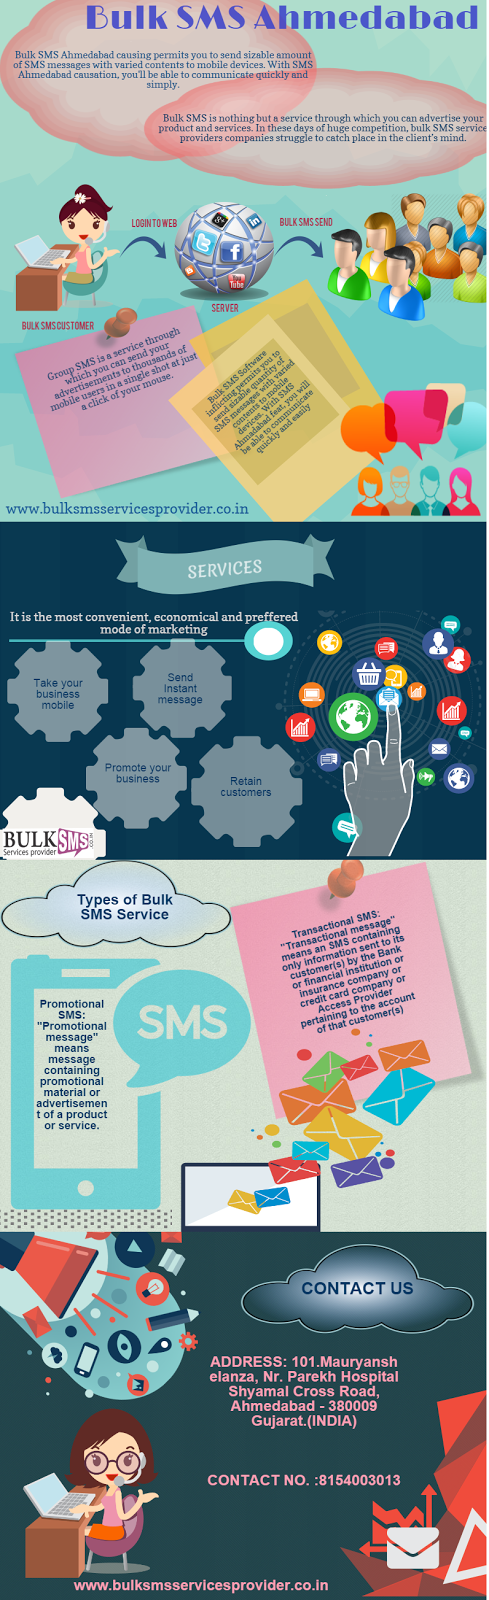 http://bulksmssoftwareahmedabad.blogspot.in/2015/08/bulk-sms-service-boon-for-professionals.html